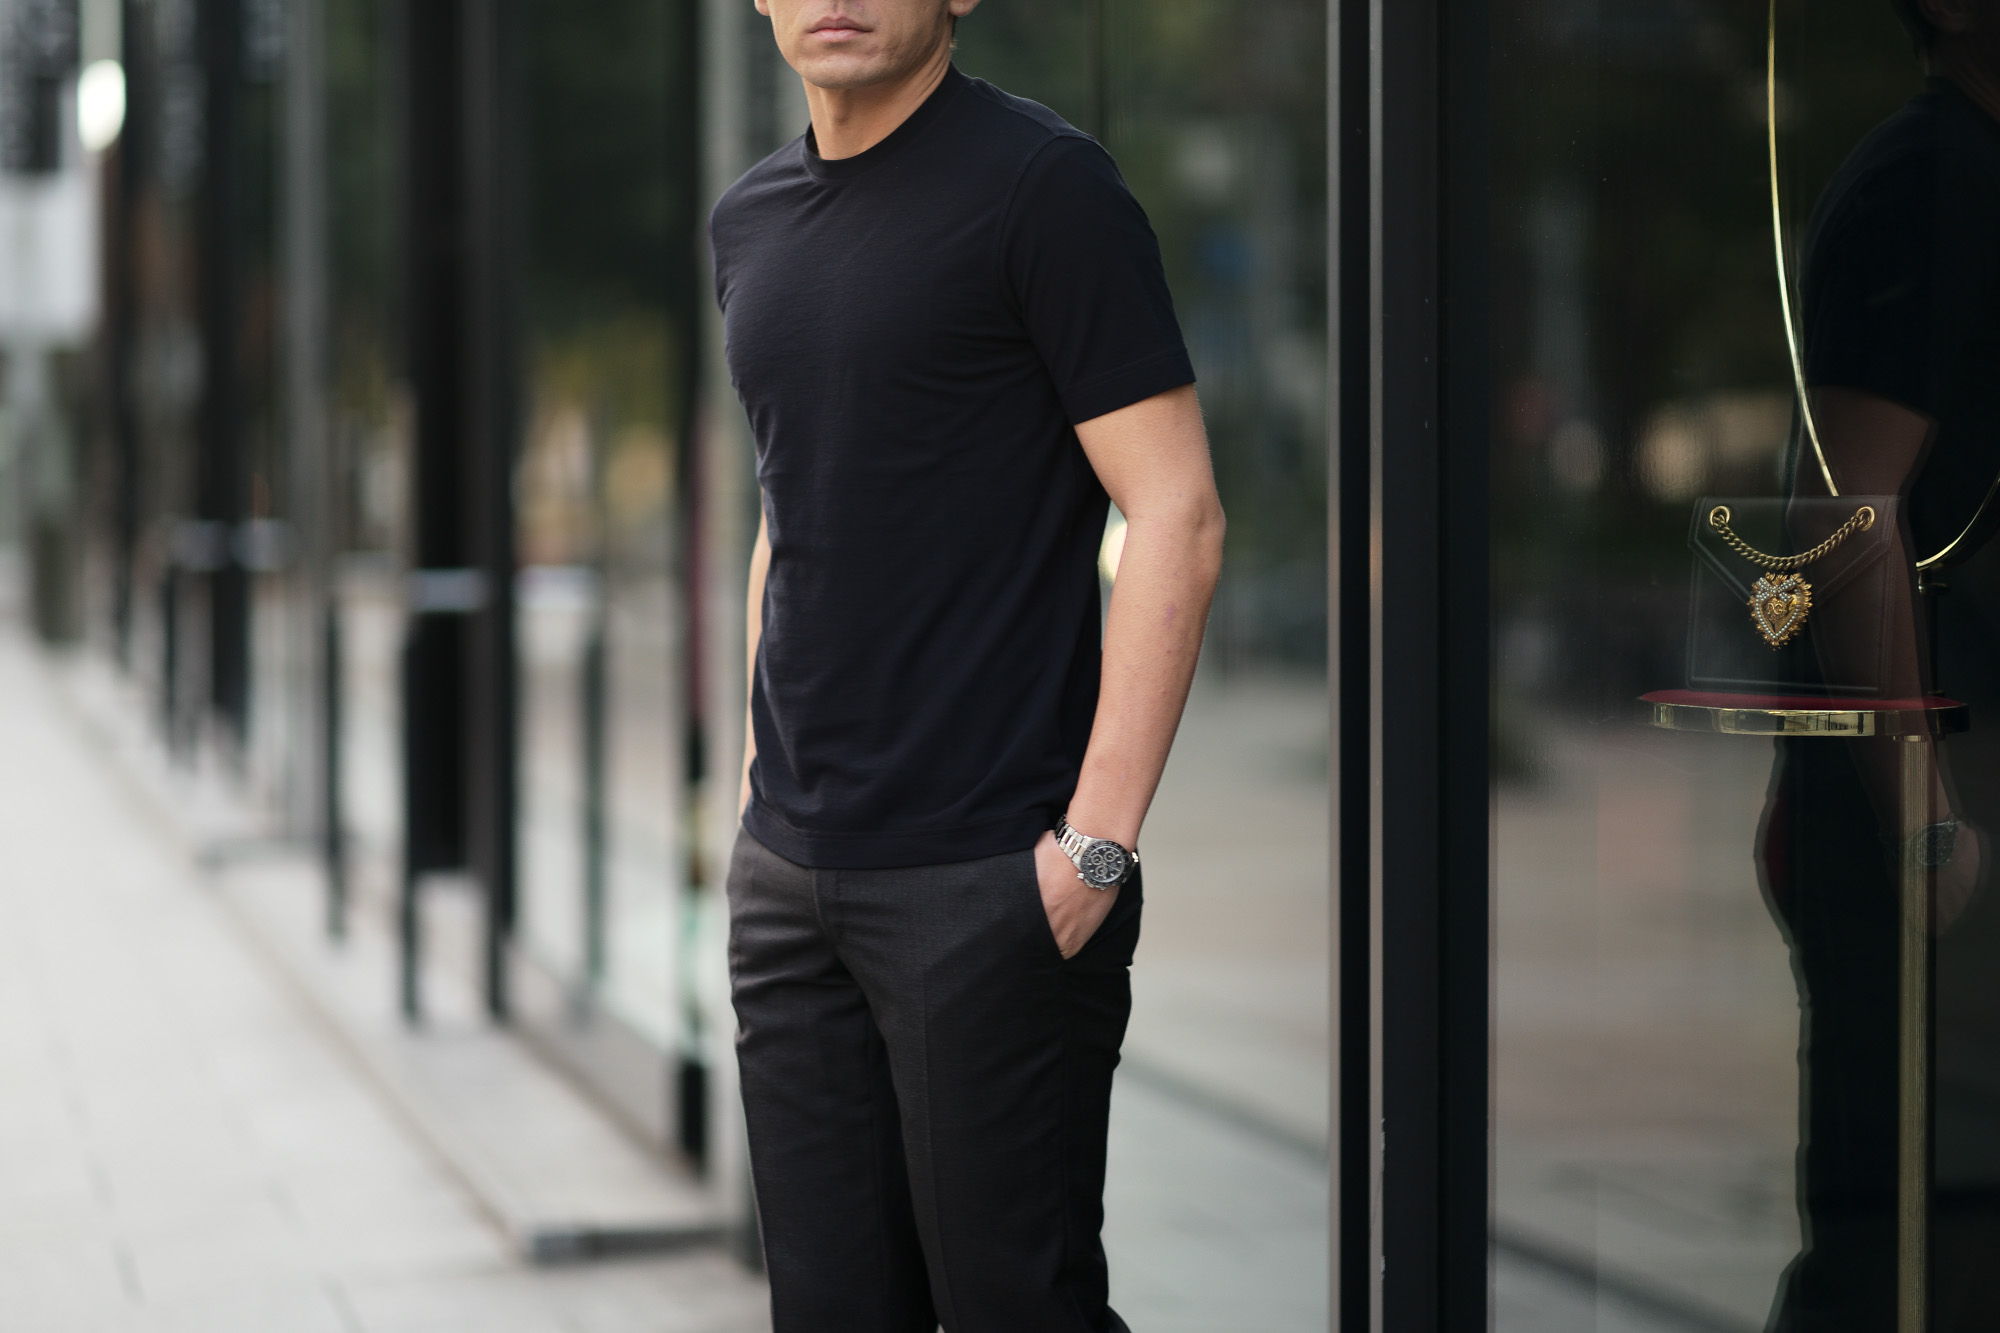 ZANONE(ザノーネ) Crew Neck T-shirt (クルーネックTシャツ) ice cotton アイスコットン Tシャツ NAVY (ネイビー・Z0542) MADE IN ITALY(イタリア製) 2020 春夏 【ご予約受付中】愛知 名古屋 altoediritto アルトエデリット tee 夏Tシャツ